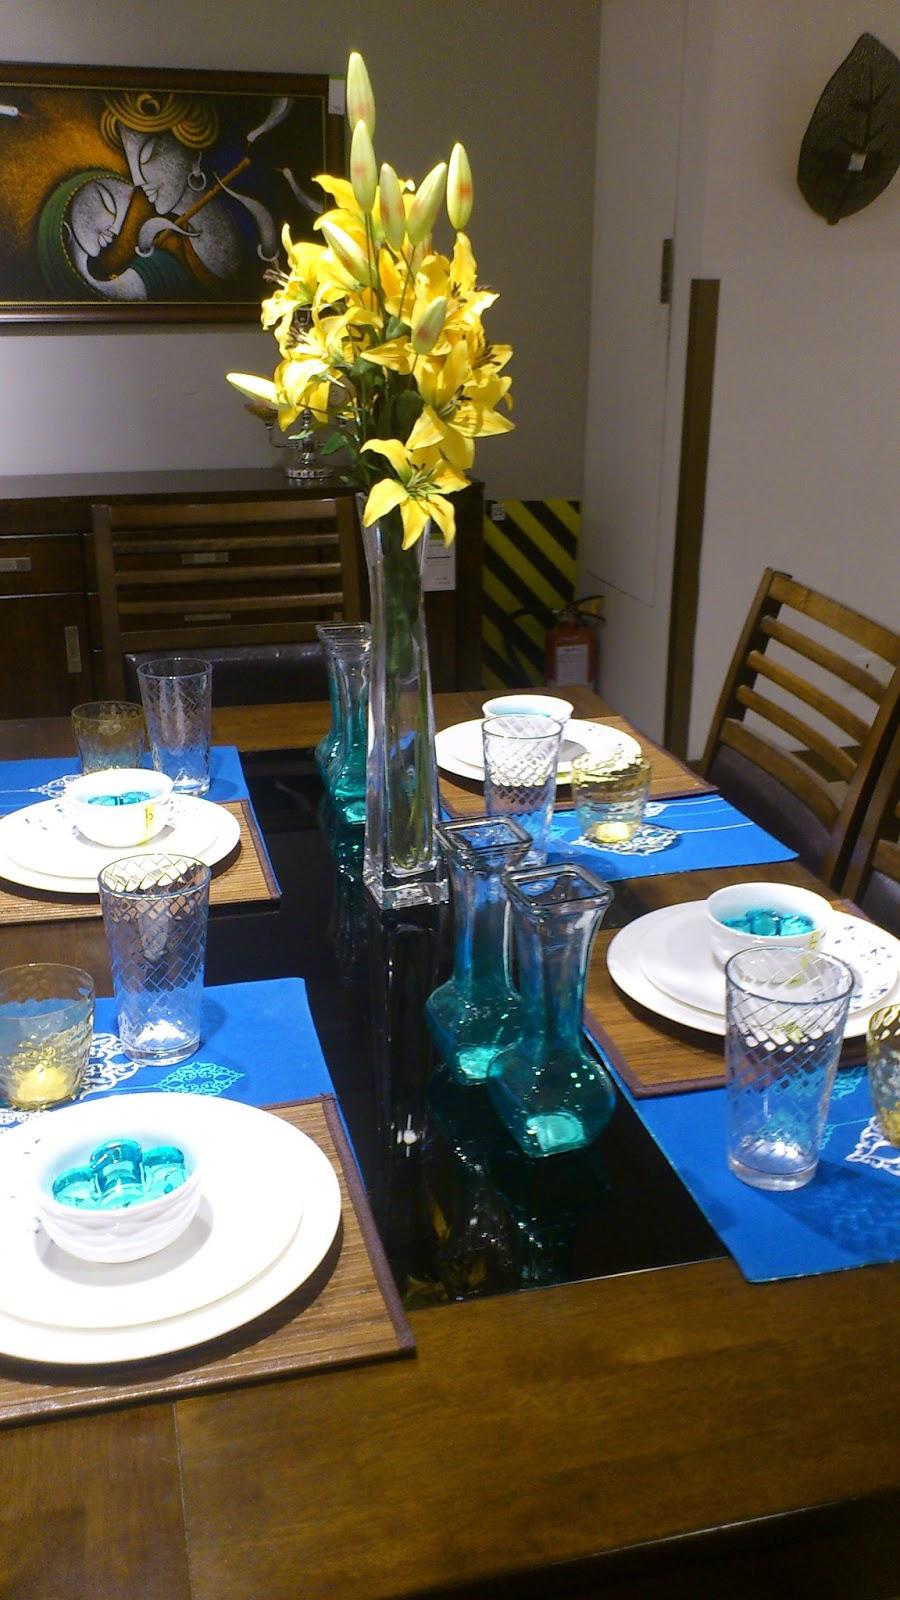 A Good Stuff Dining Table Decor